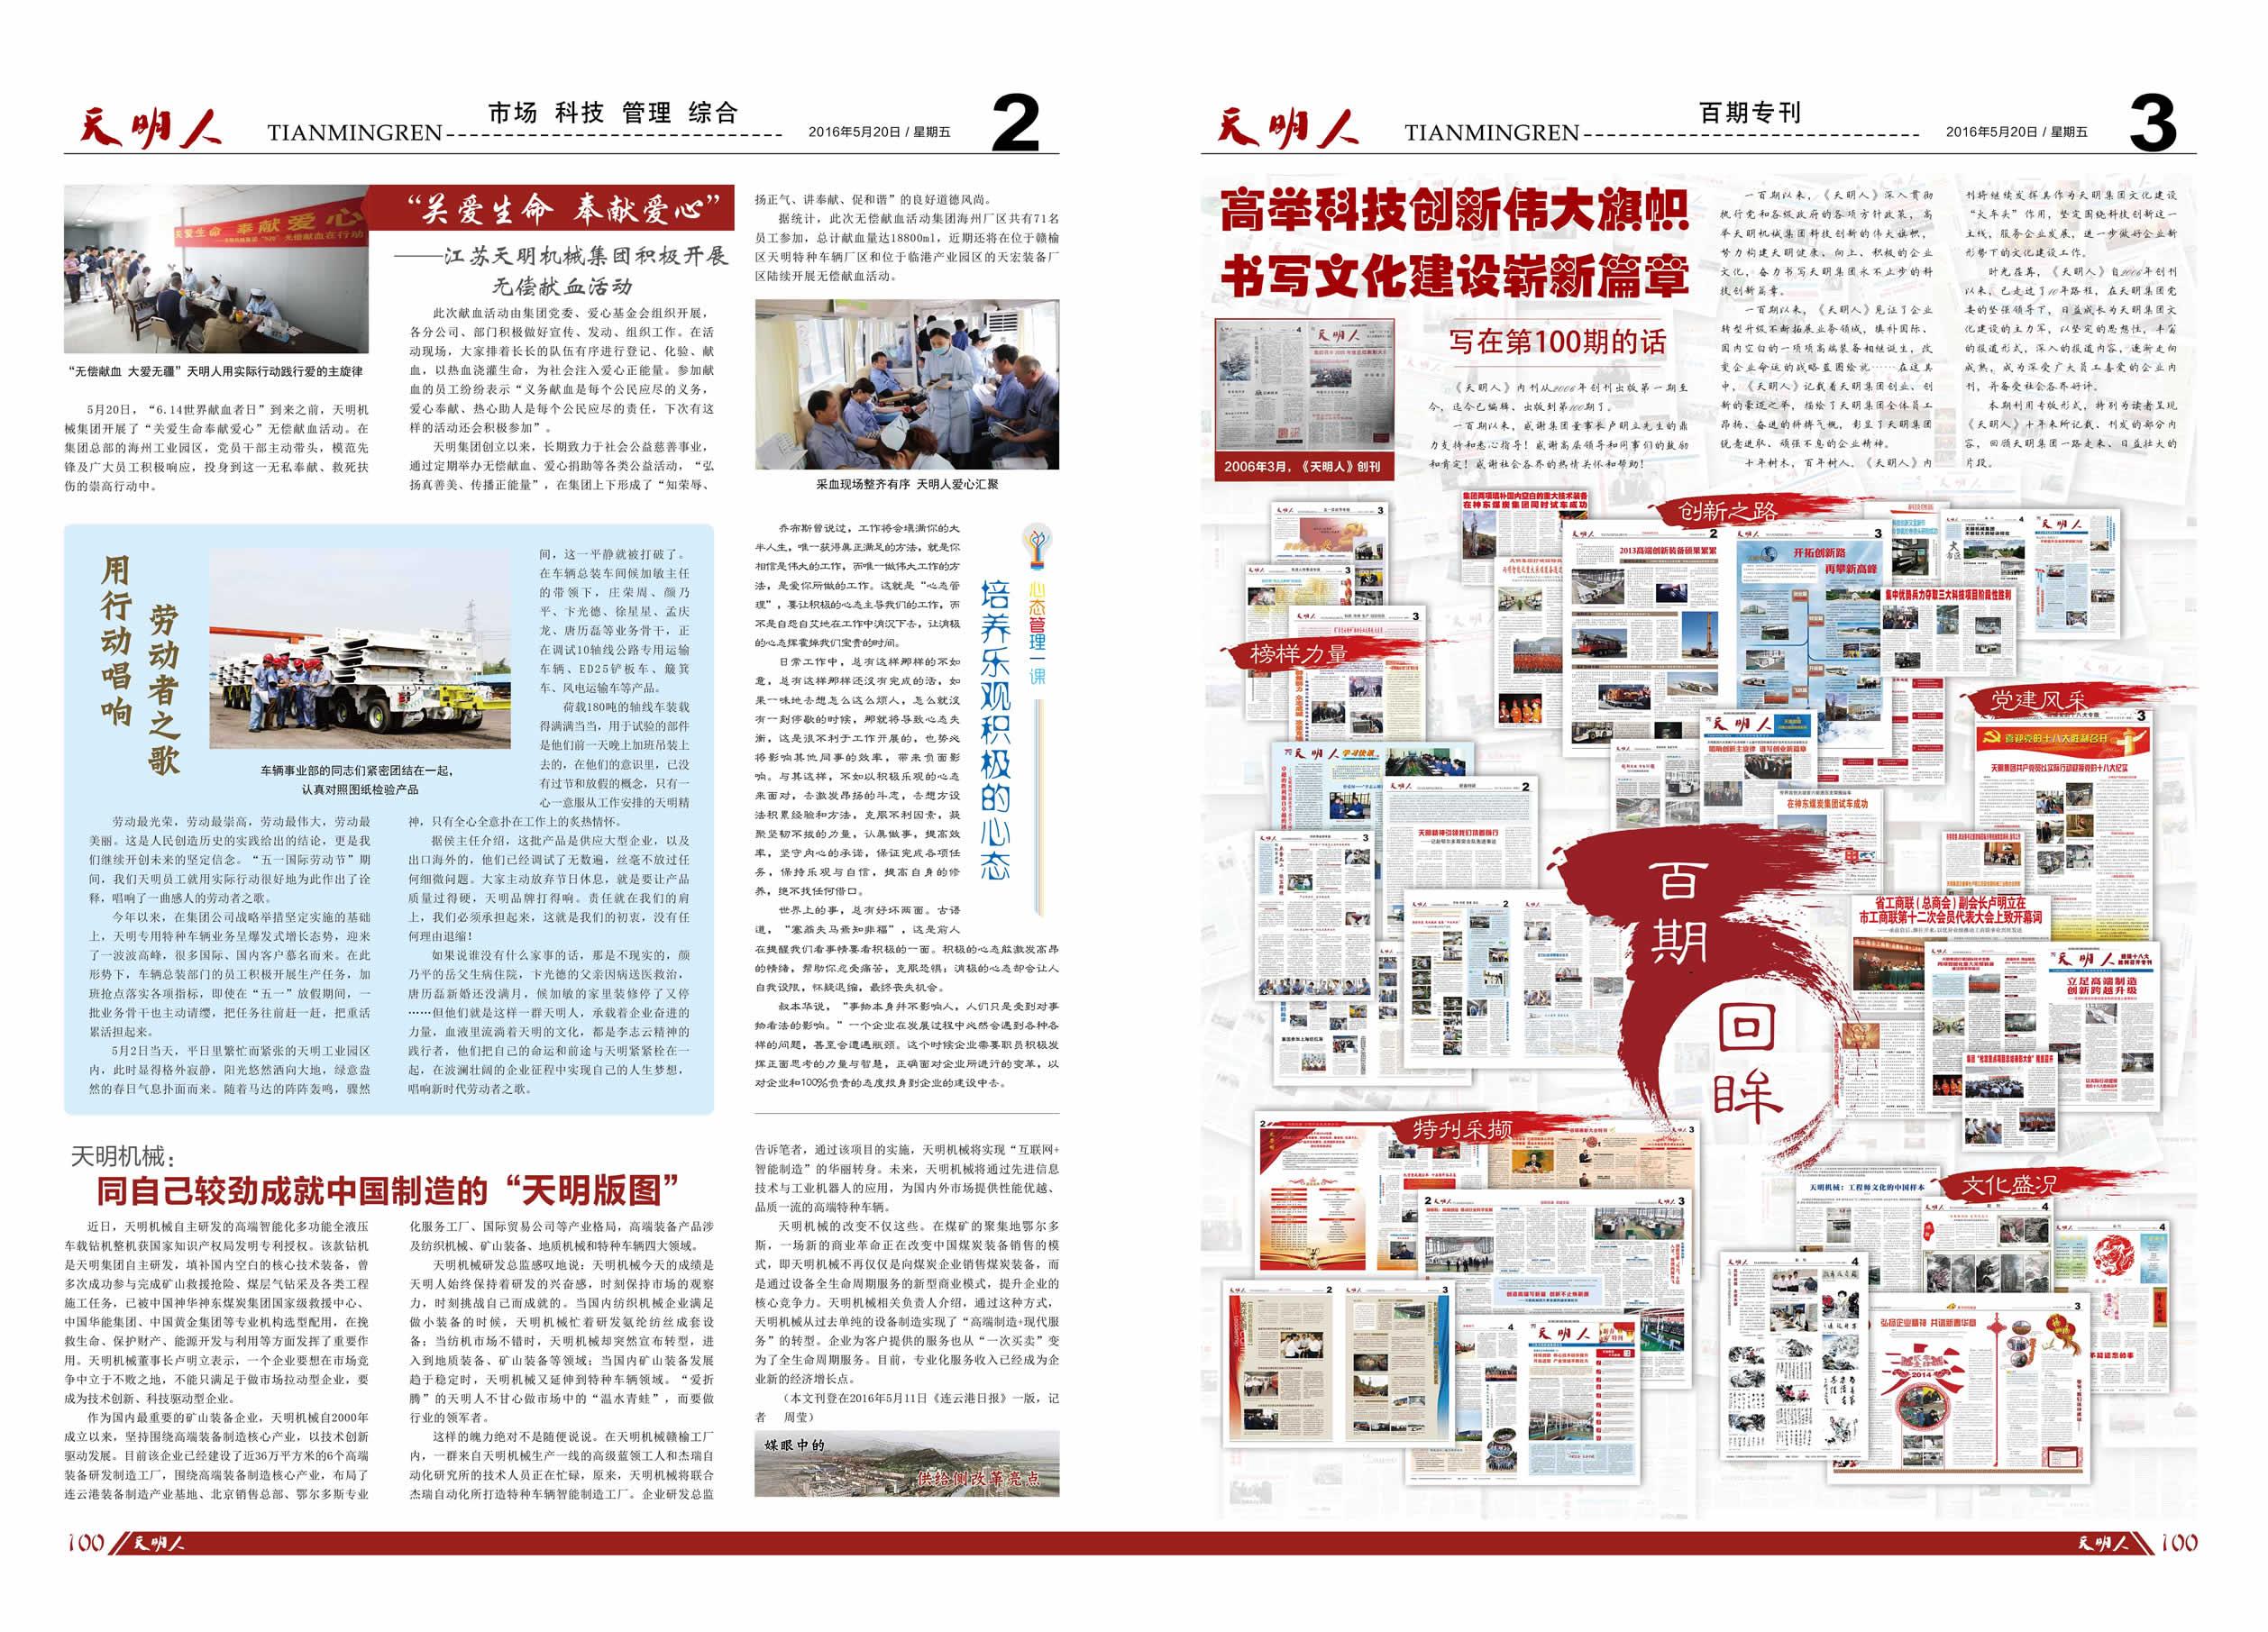 hg711皇冠国际_hg88皇冠国际平台_hg皇冠国际vip首页人2016第05期(总第100期)2、3版